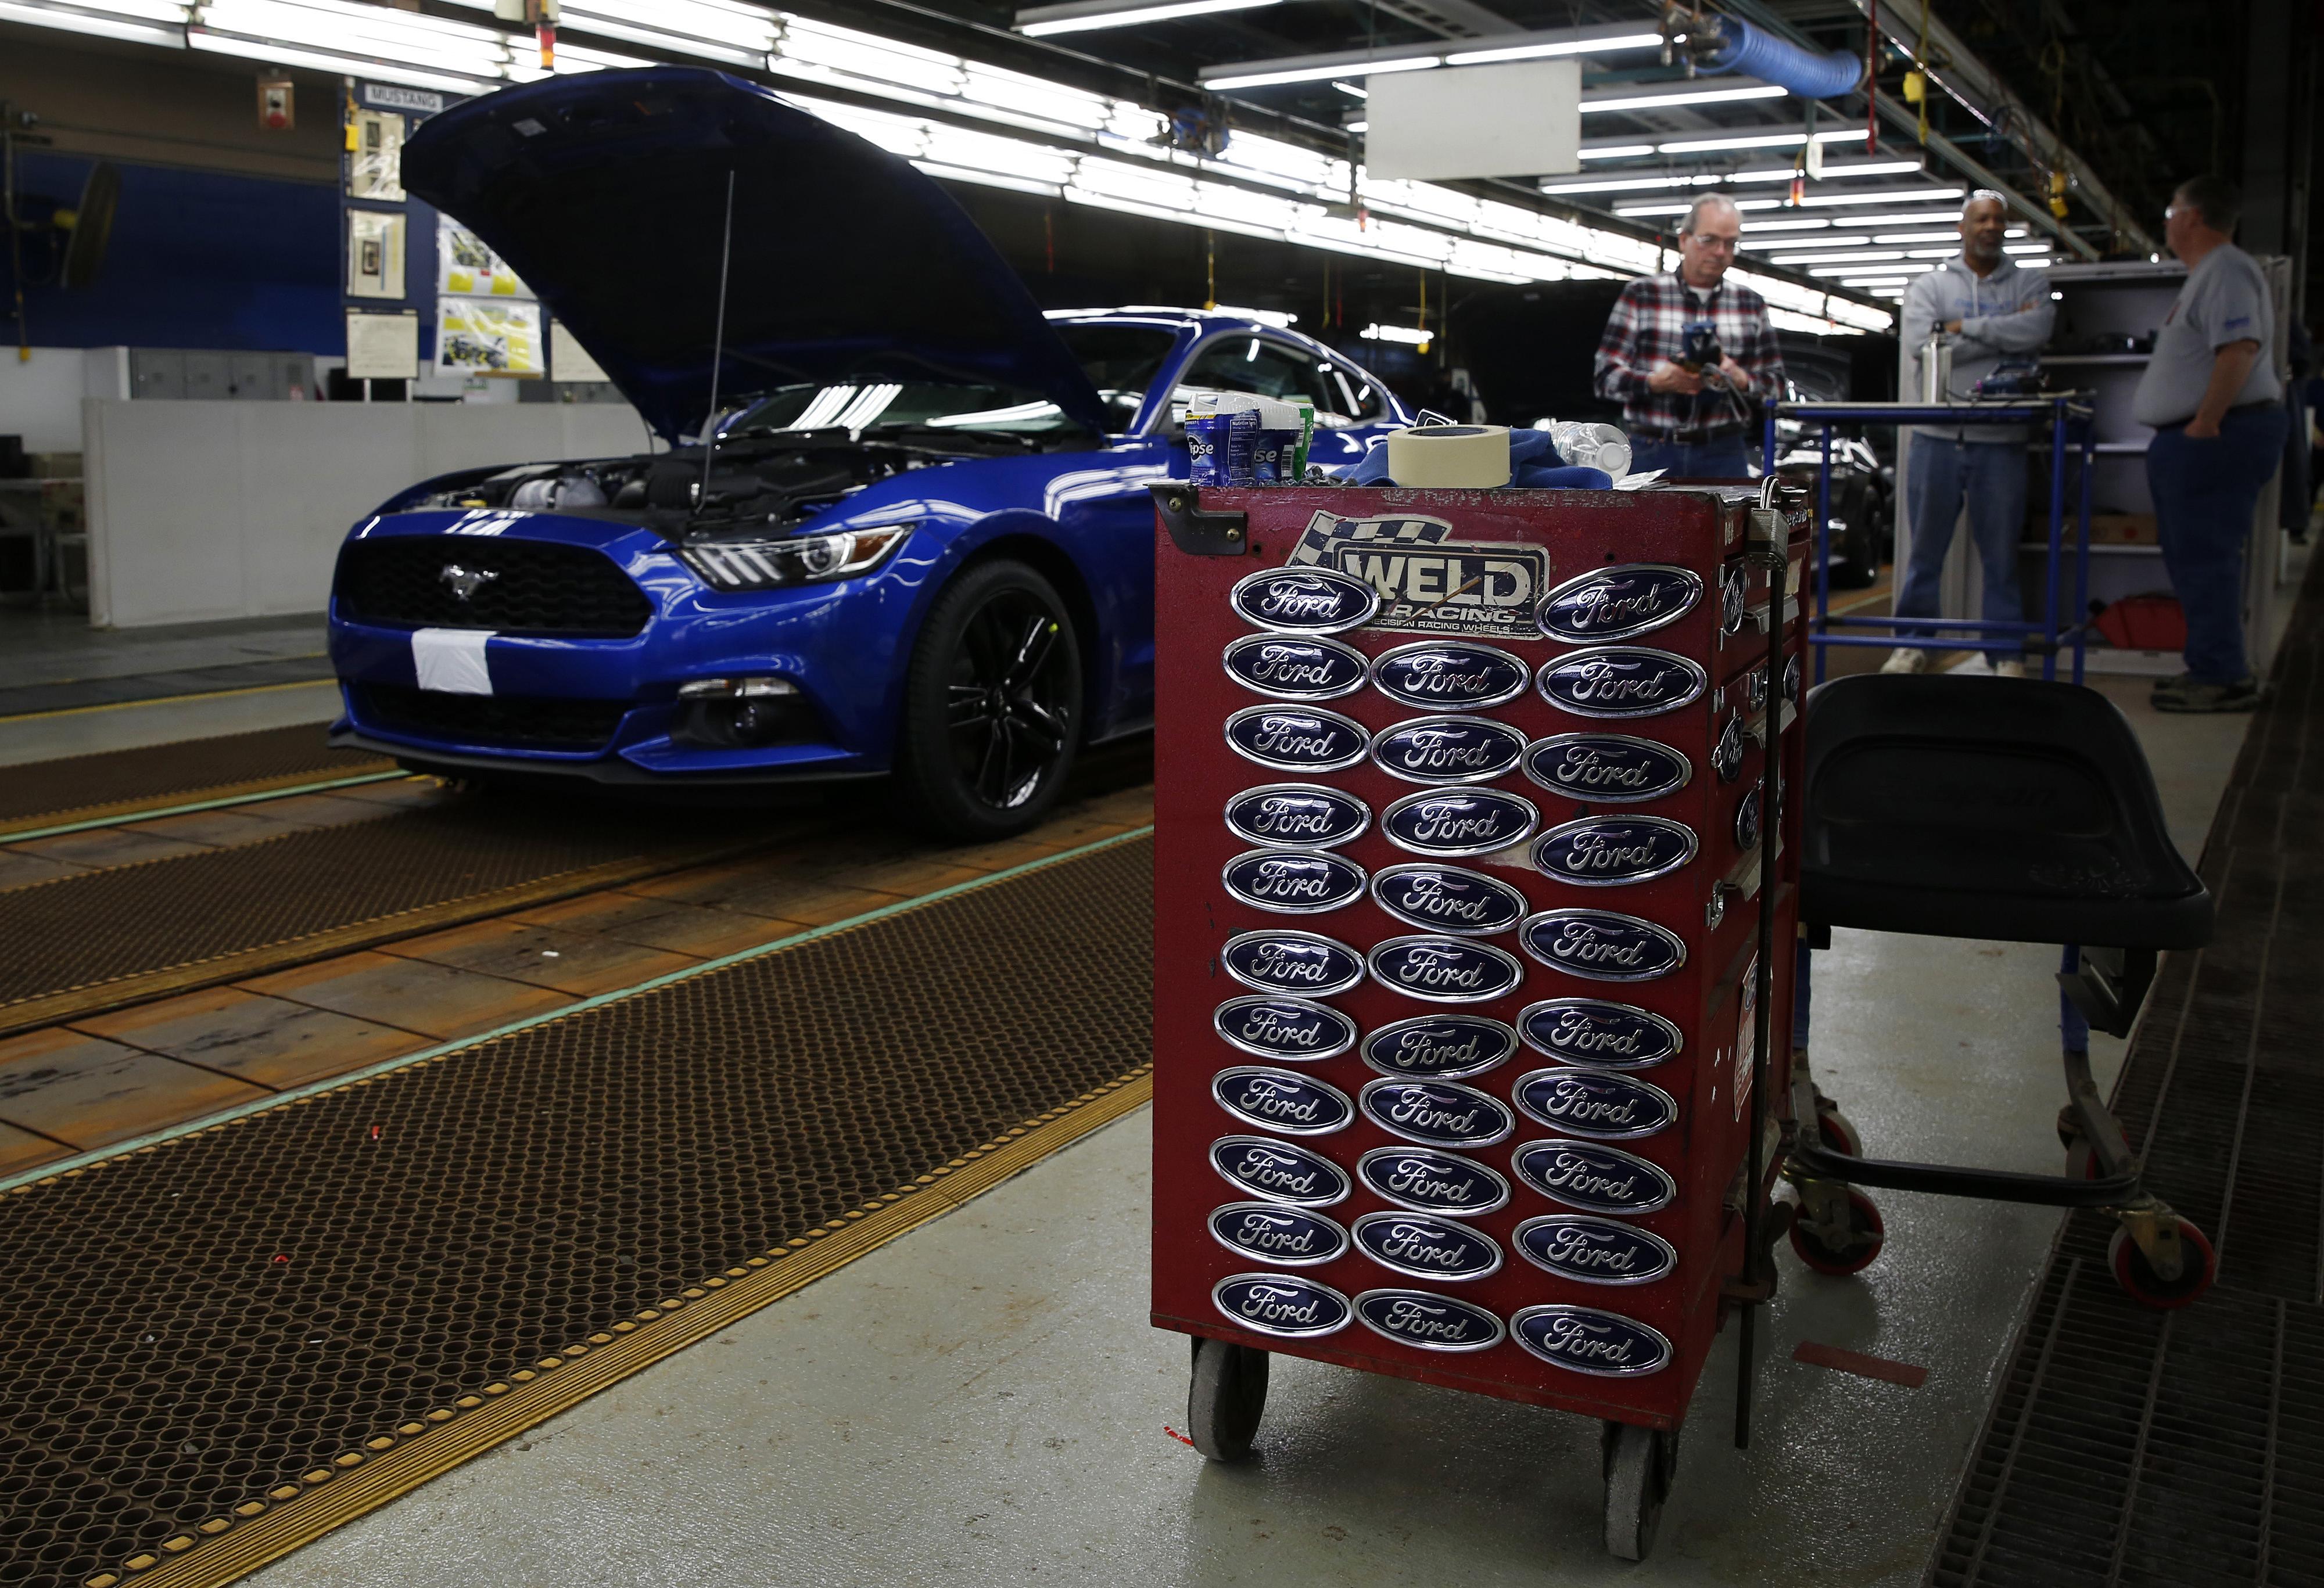 Ford Cancels $1.6 Billion Mexico Plant After Trump's Criticism